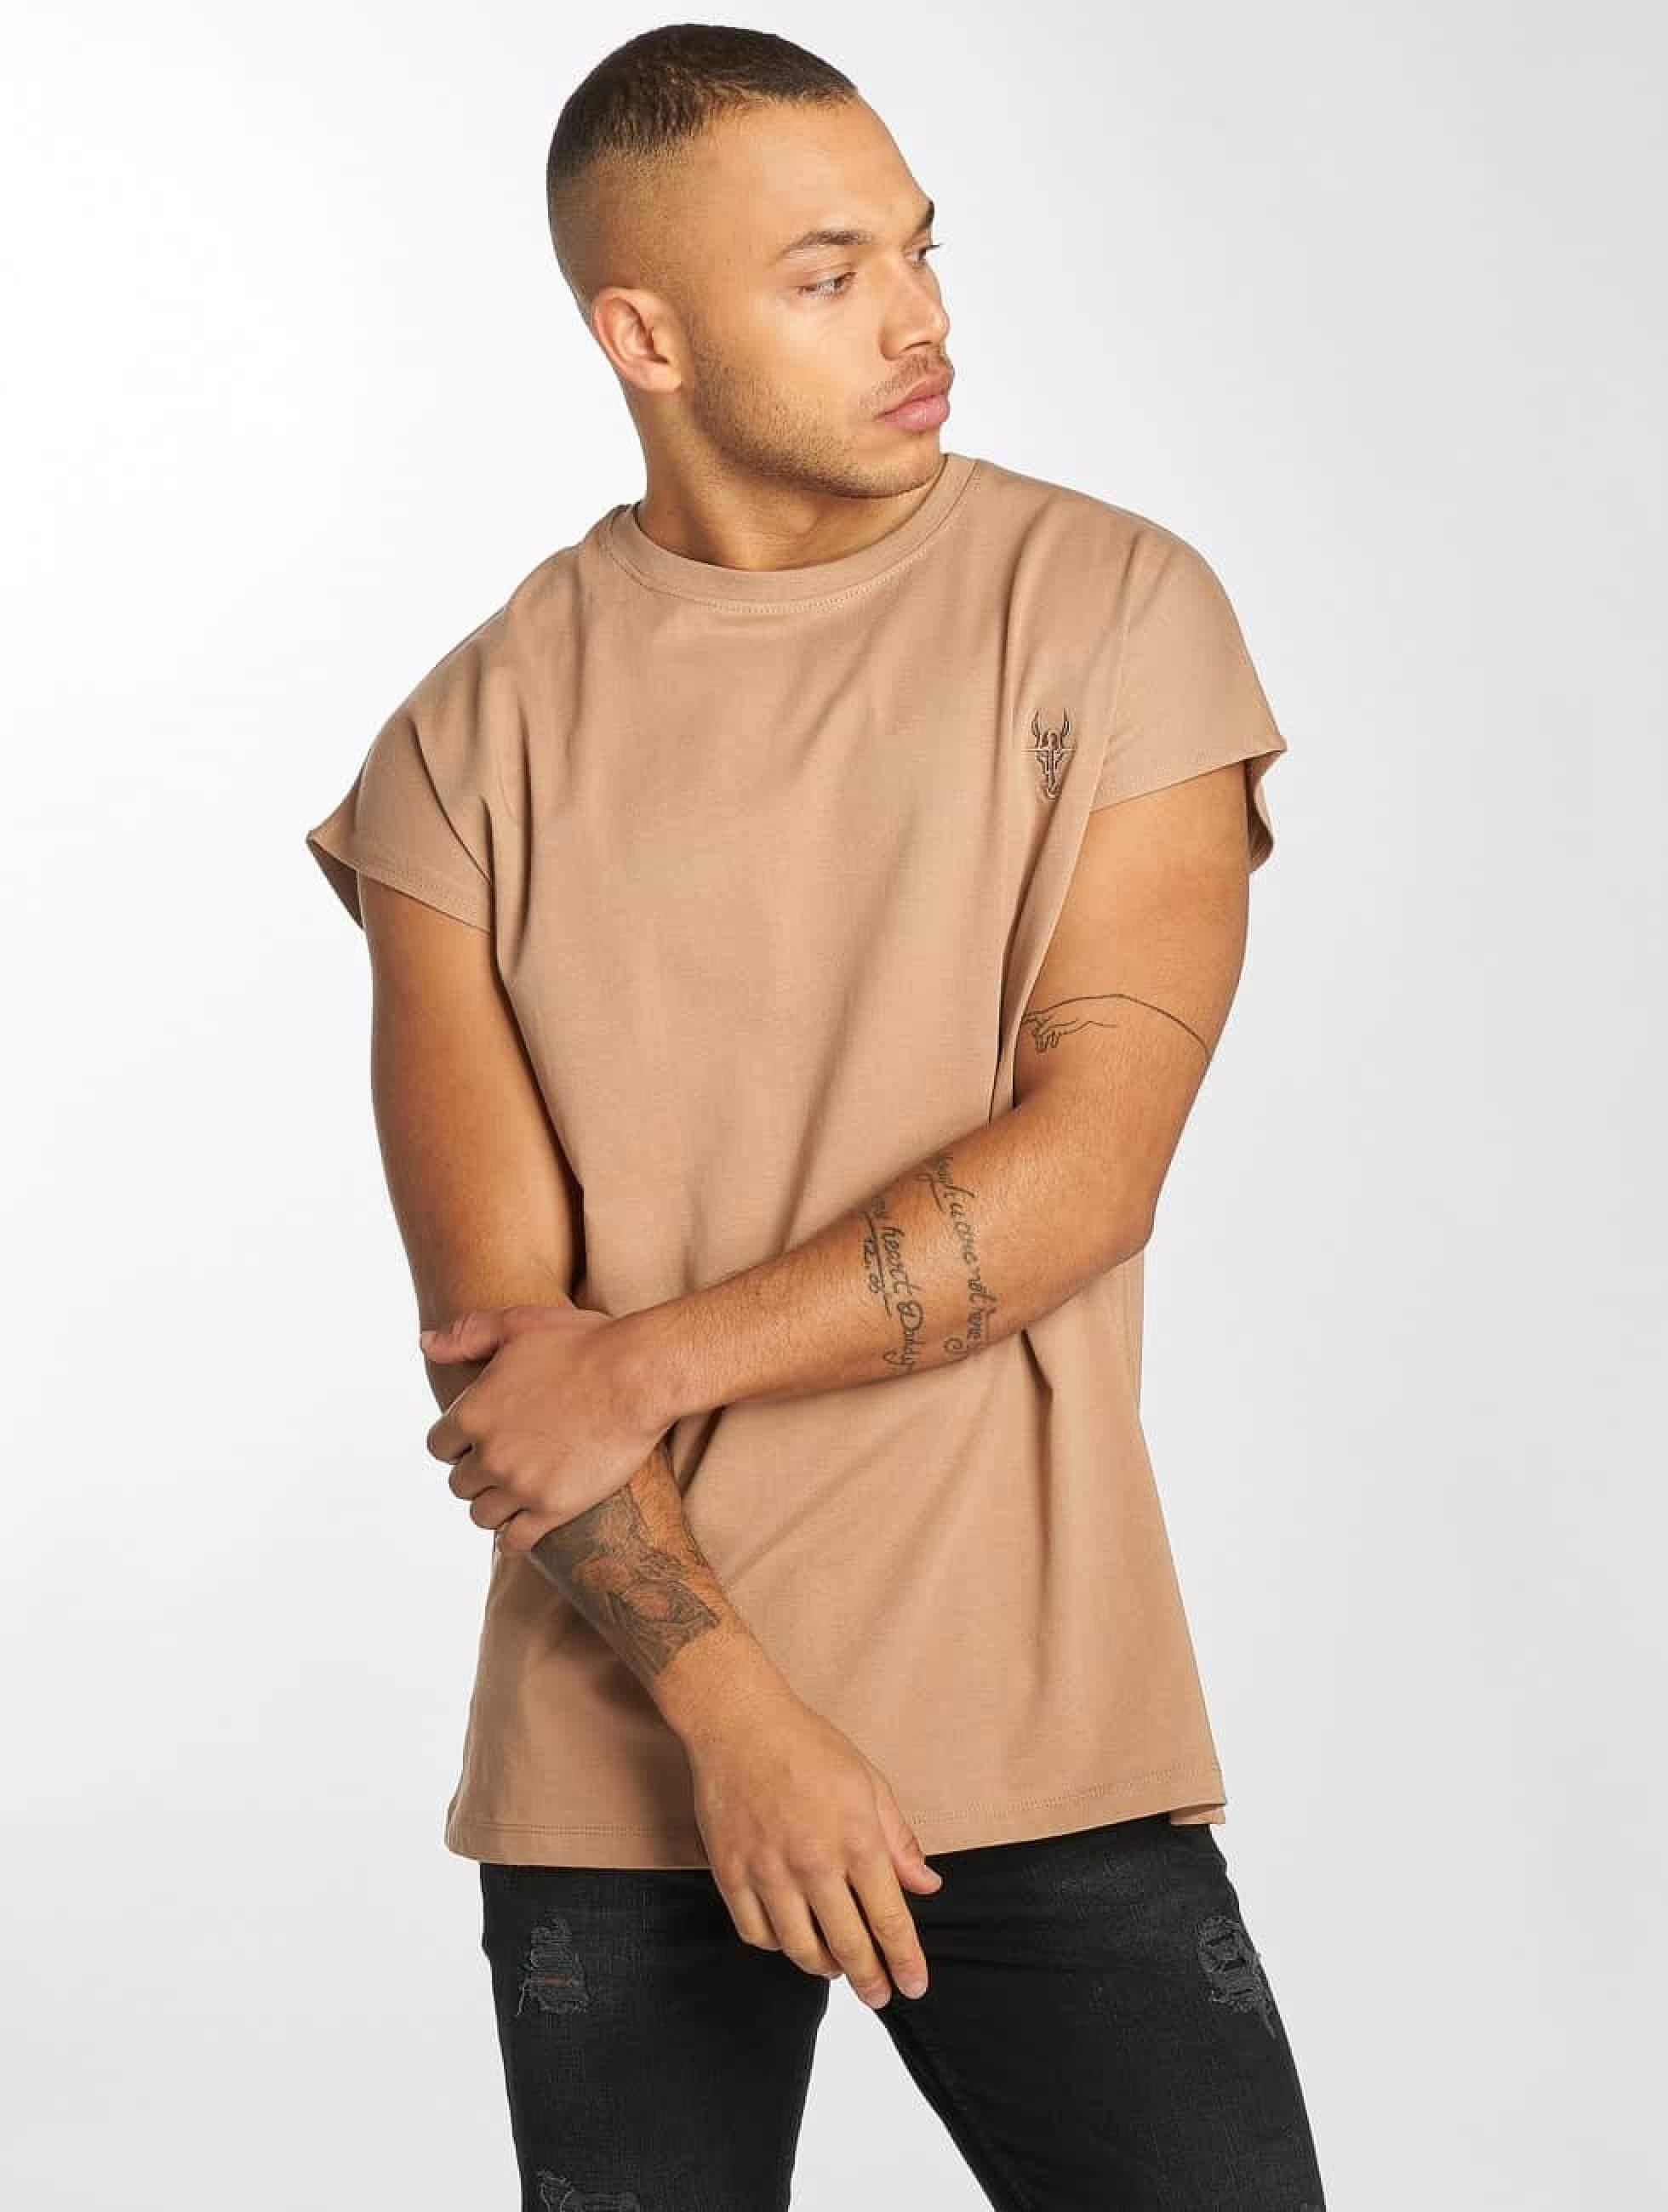 De Ferro / T-Shirt Bat Sleeve in brown S